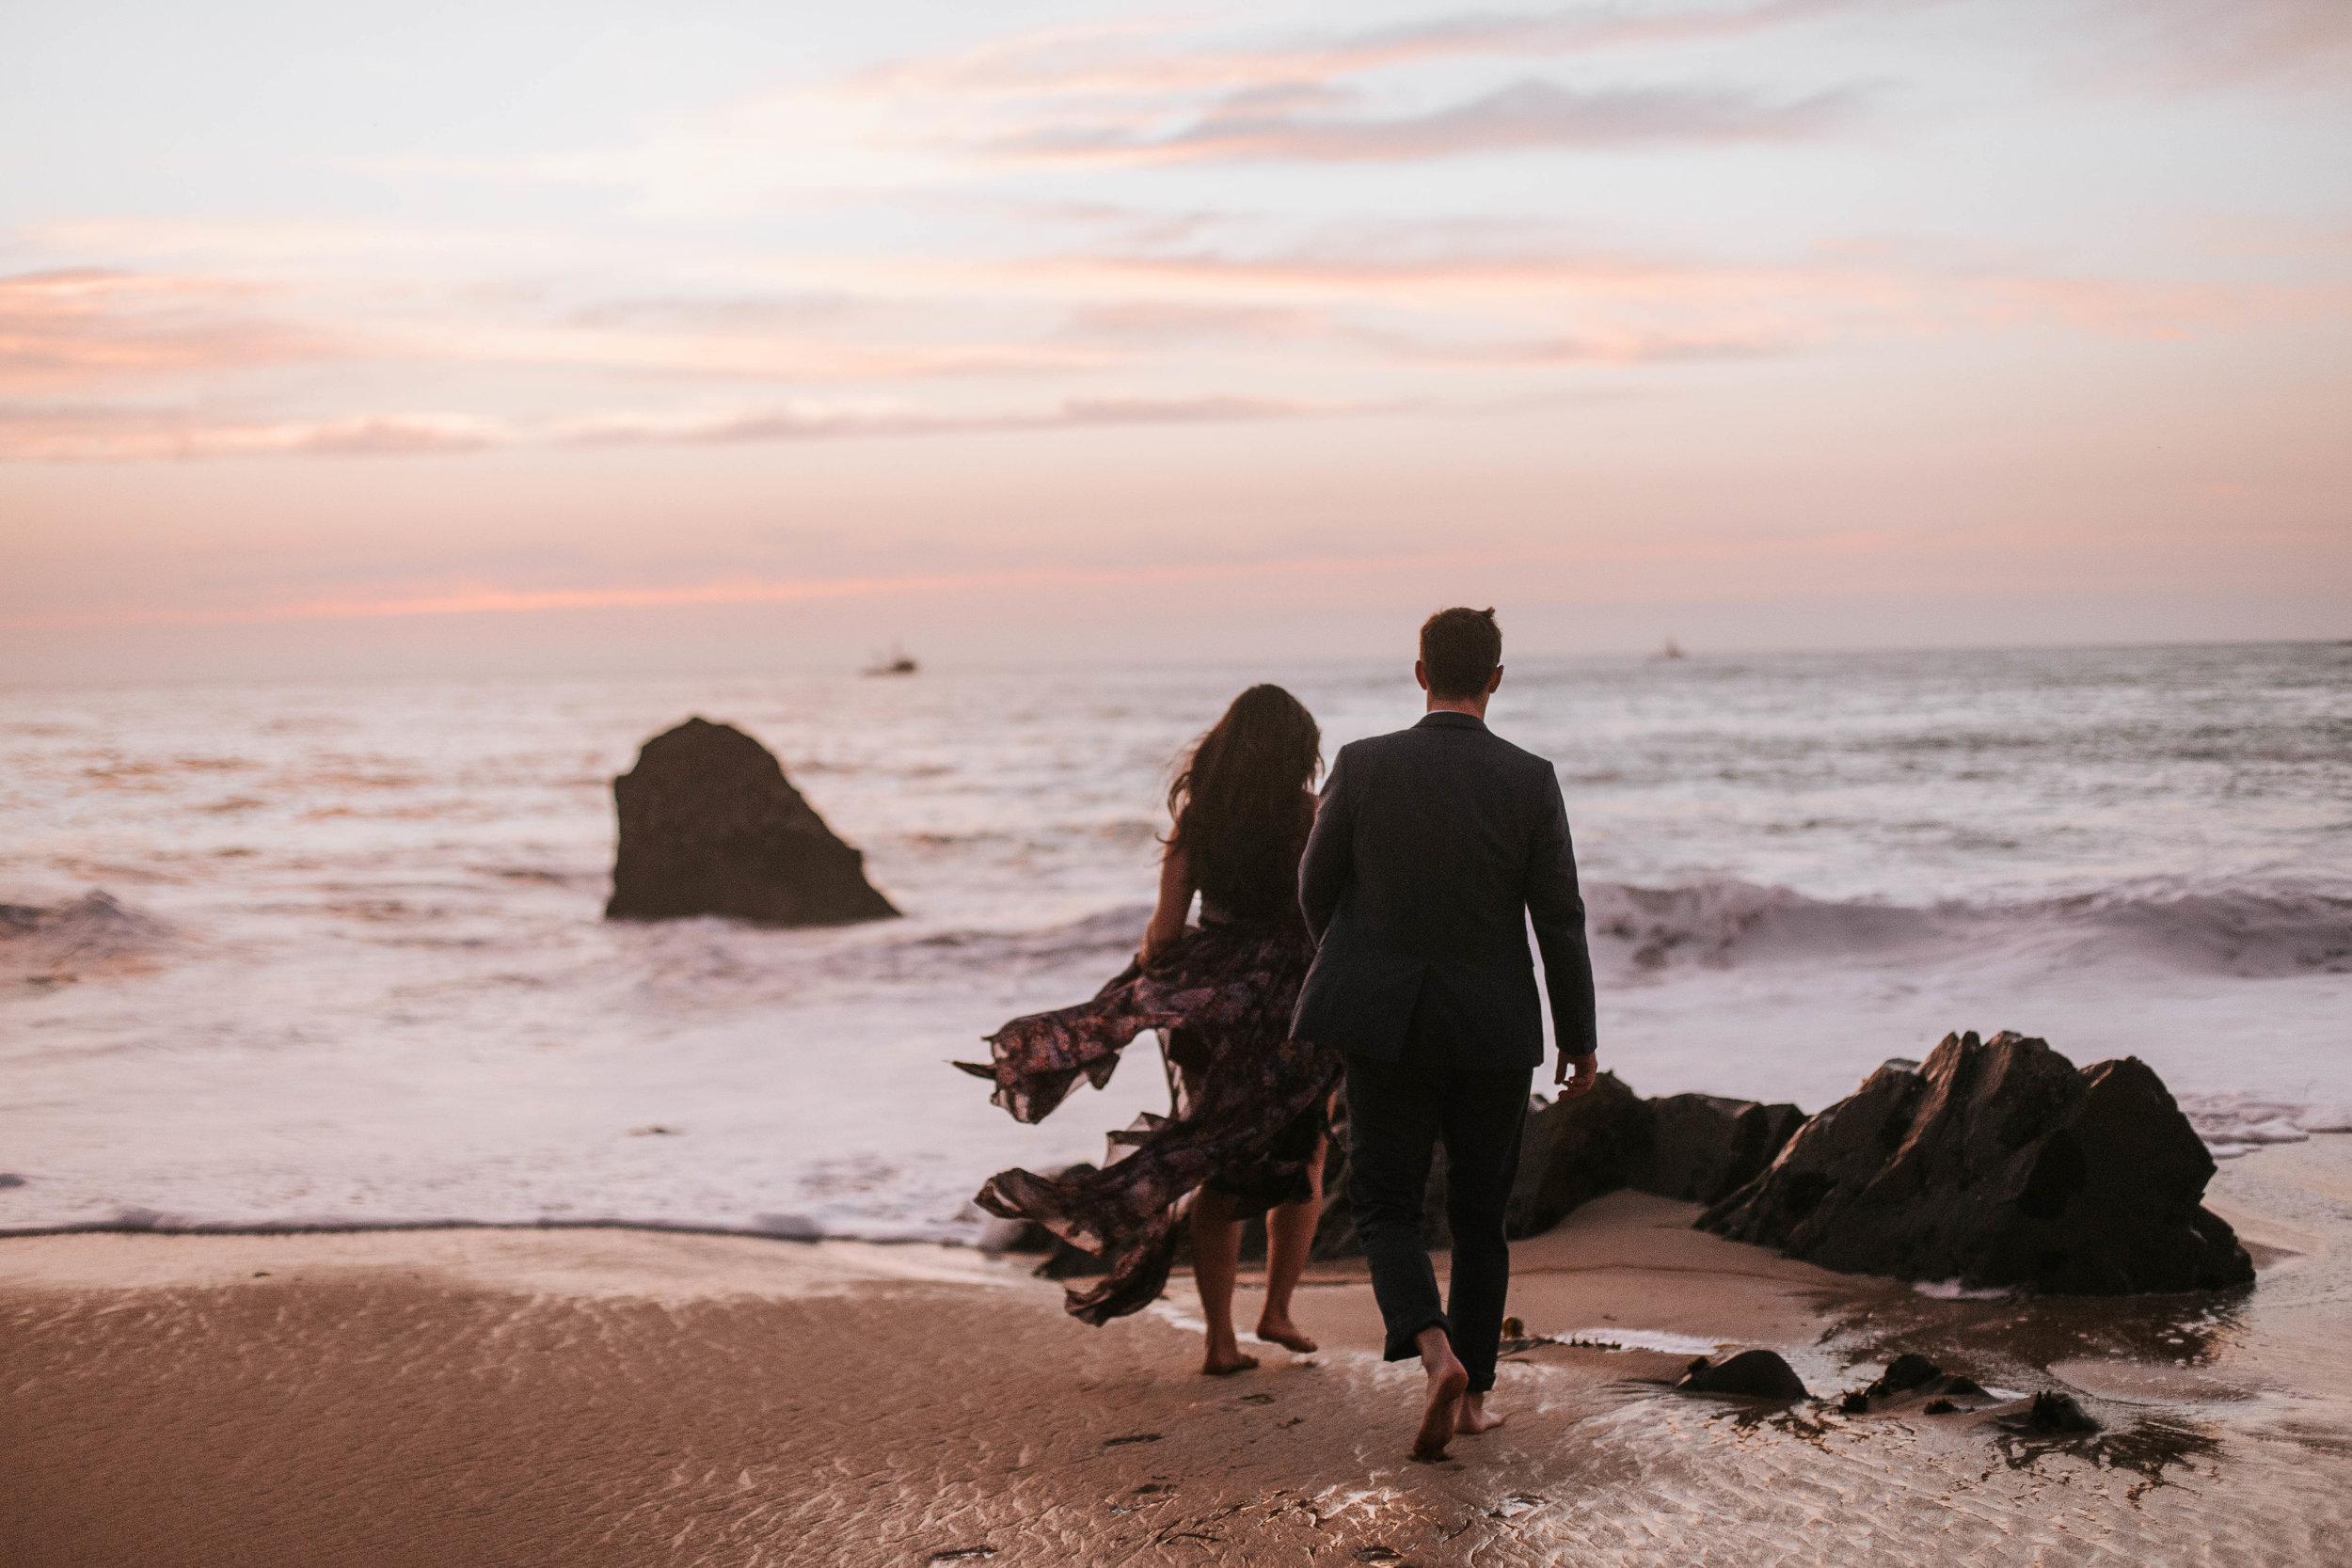 nicole-daacke-photography-big-sur-california-coast-adventure-engagement-photos-adventurous-elopement-intimate-wedding-photographer-golden-coastal-cali-engagement-session-33.jpg